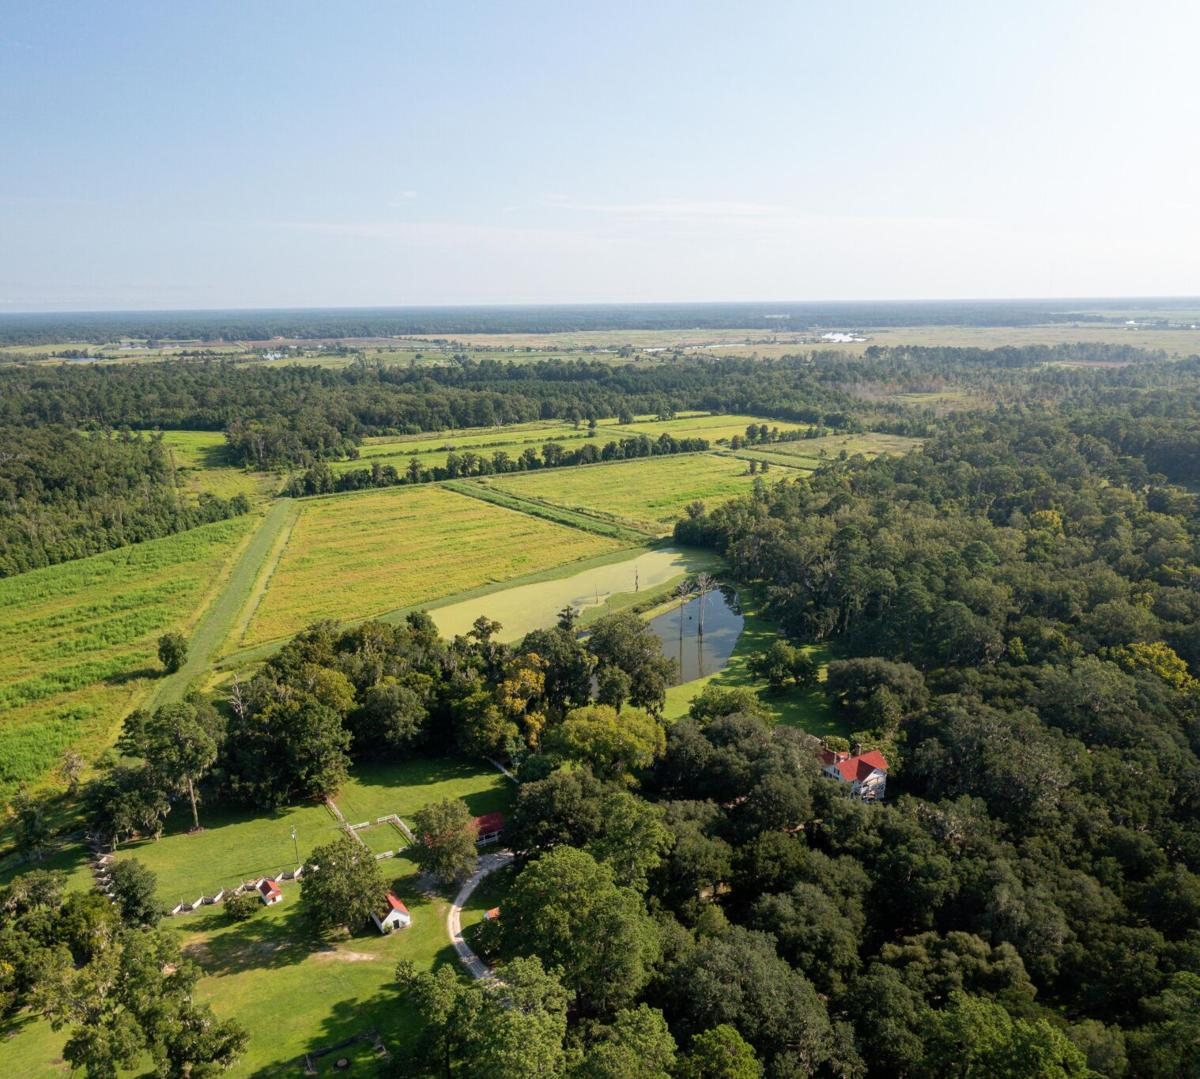 Pano view of Twick